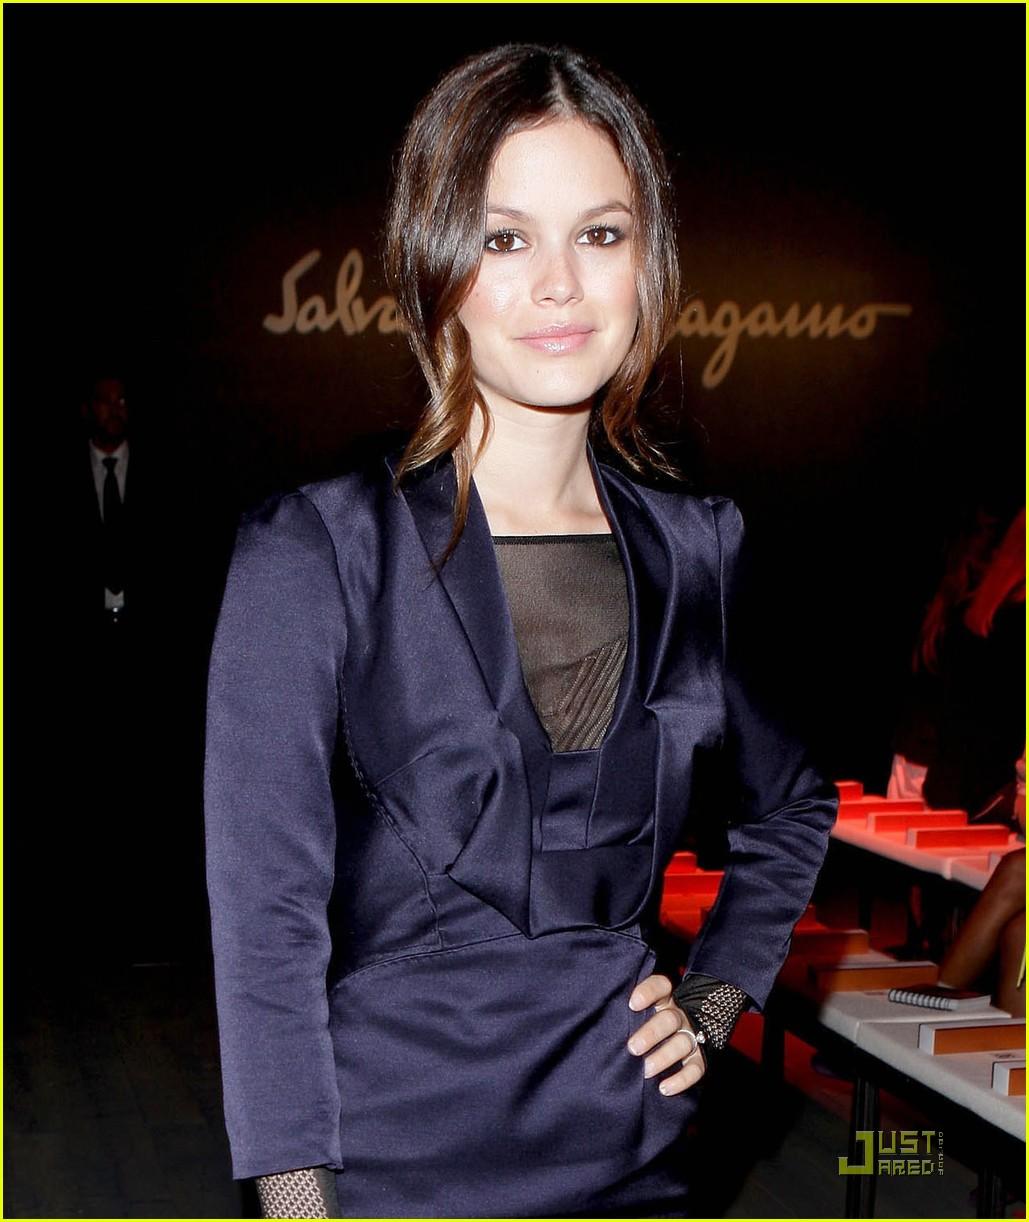 Rachel Milan